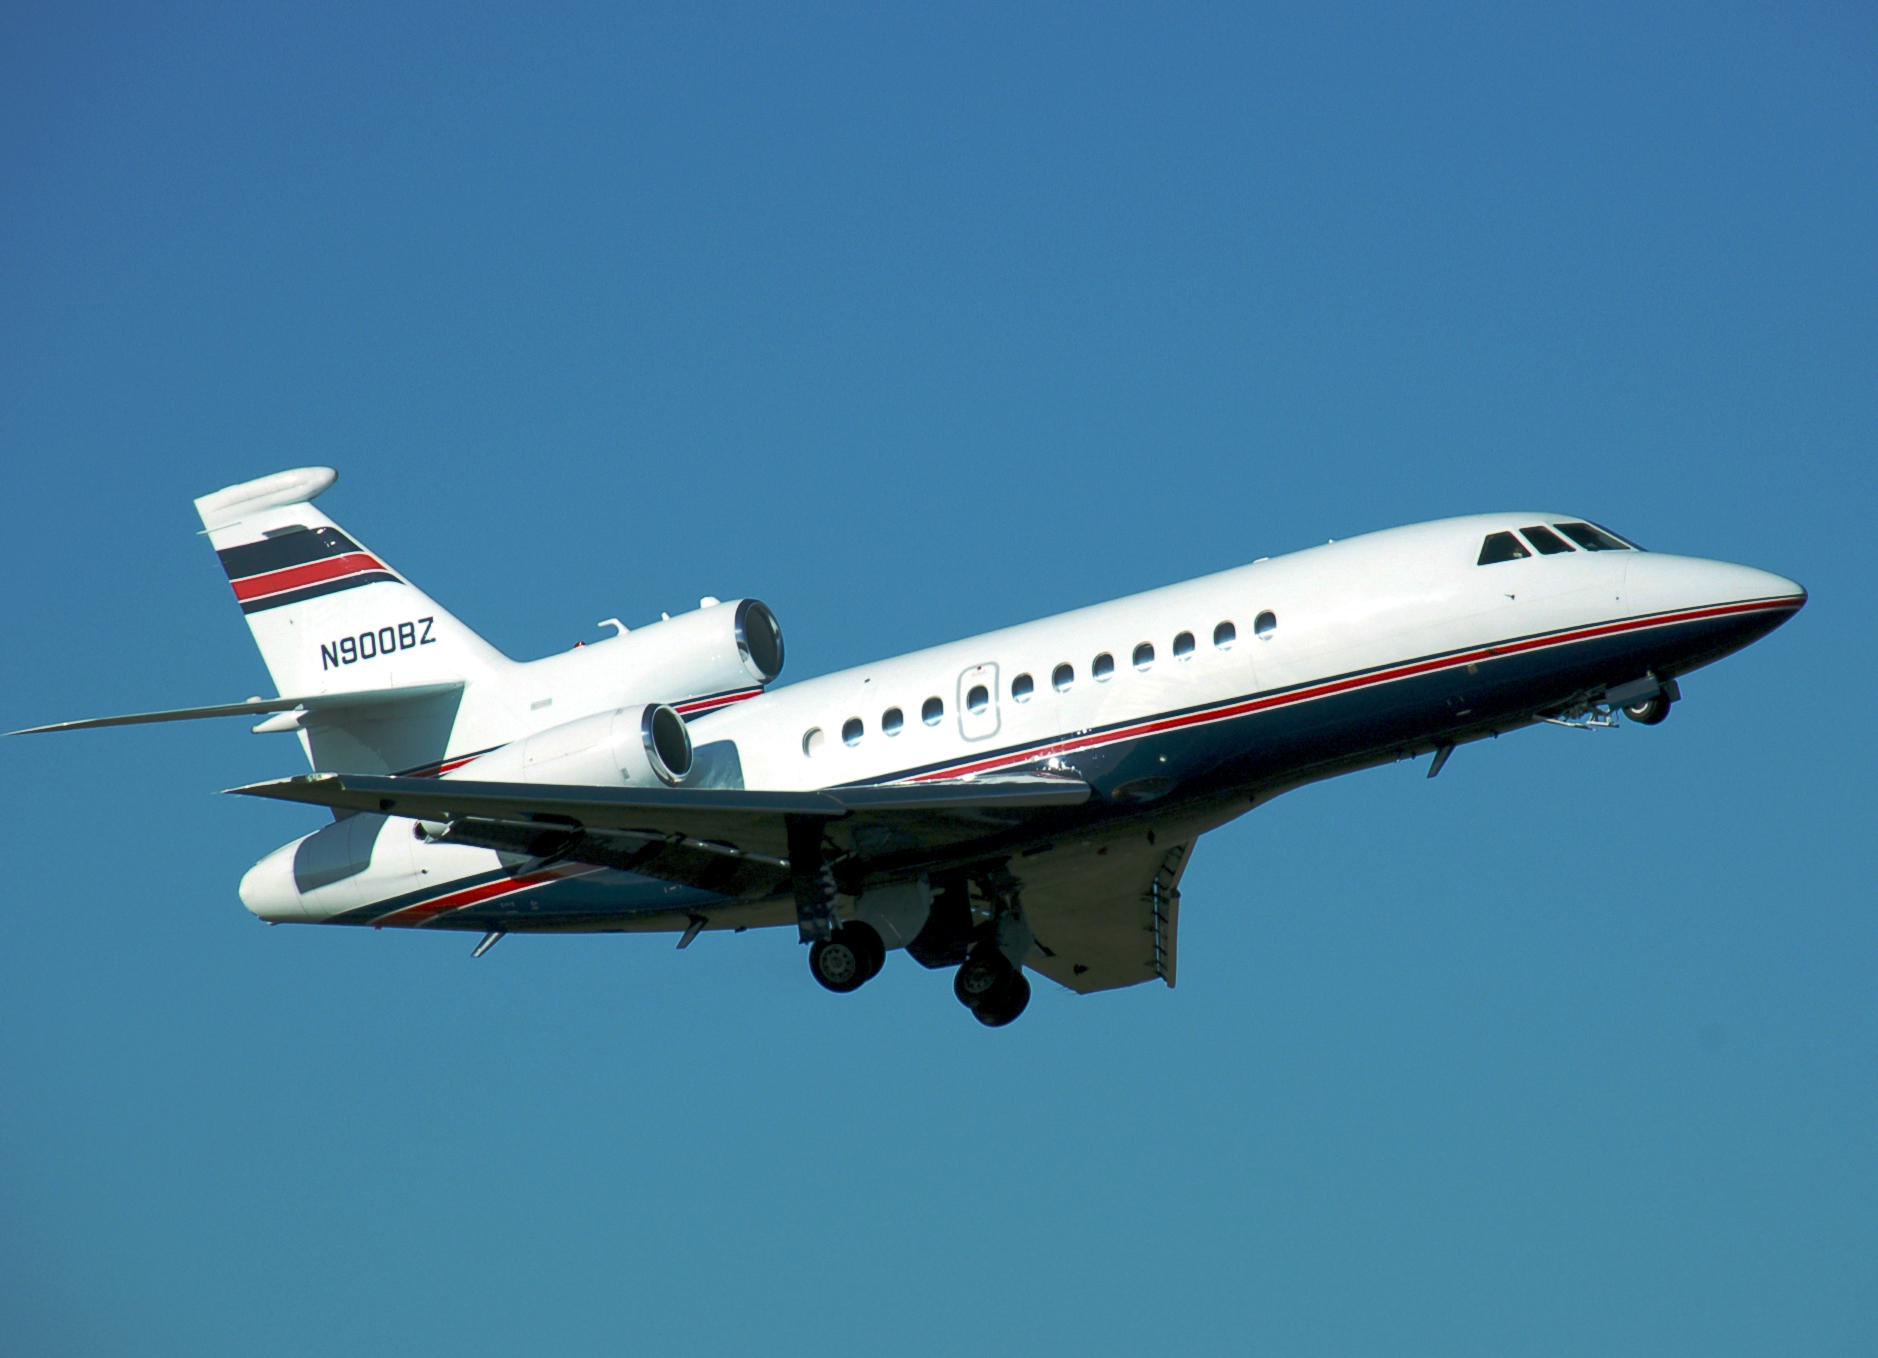 Cool jet airlines dassault falcon 900 dx interior - Filename Dassault Falcon 900 01 Jpg